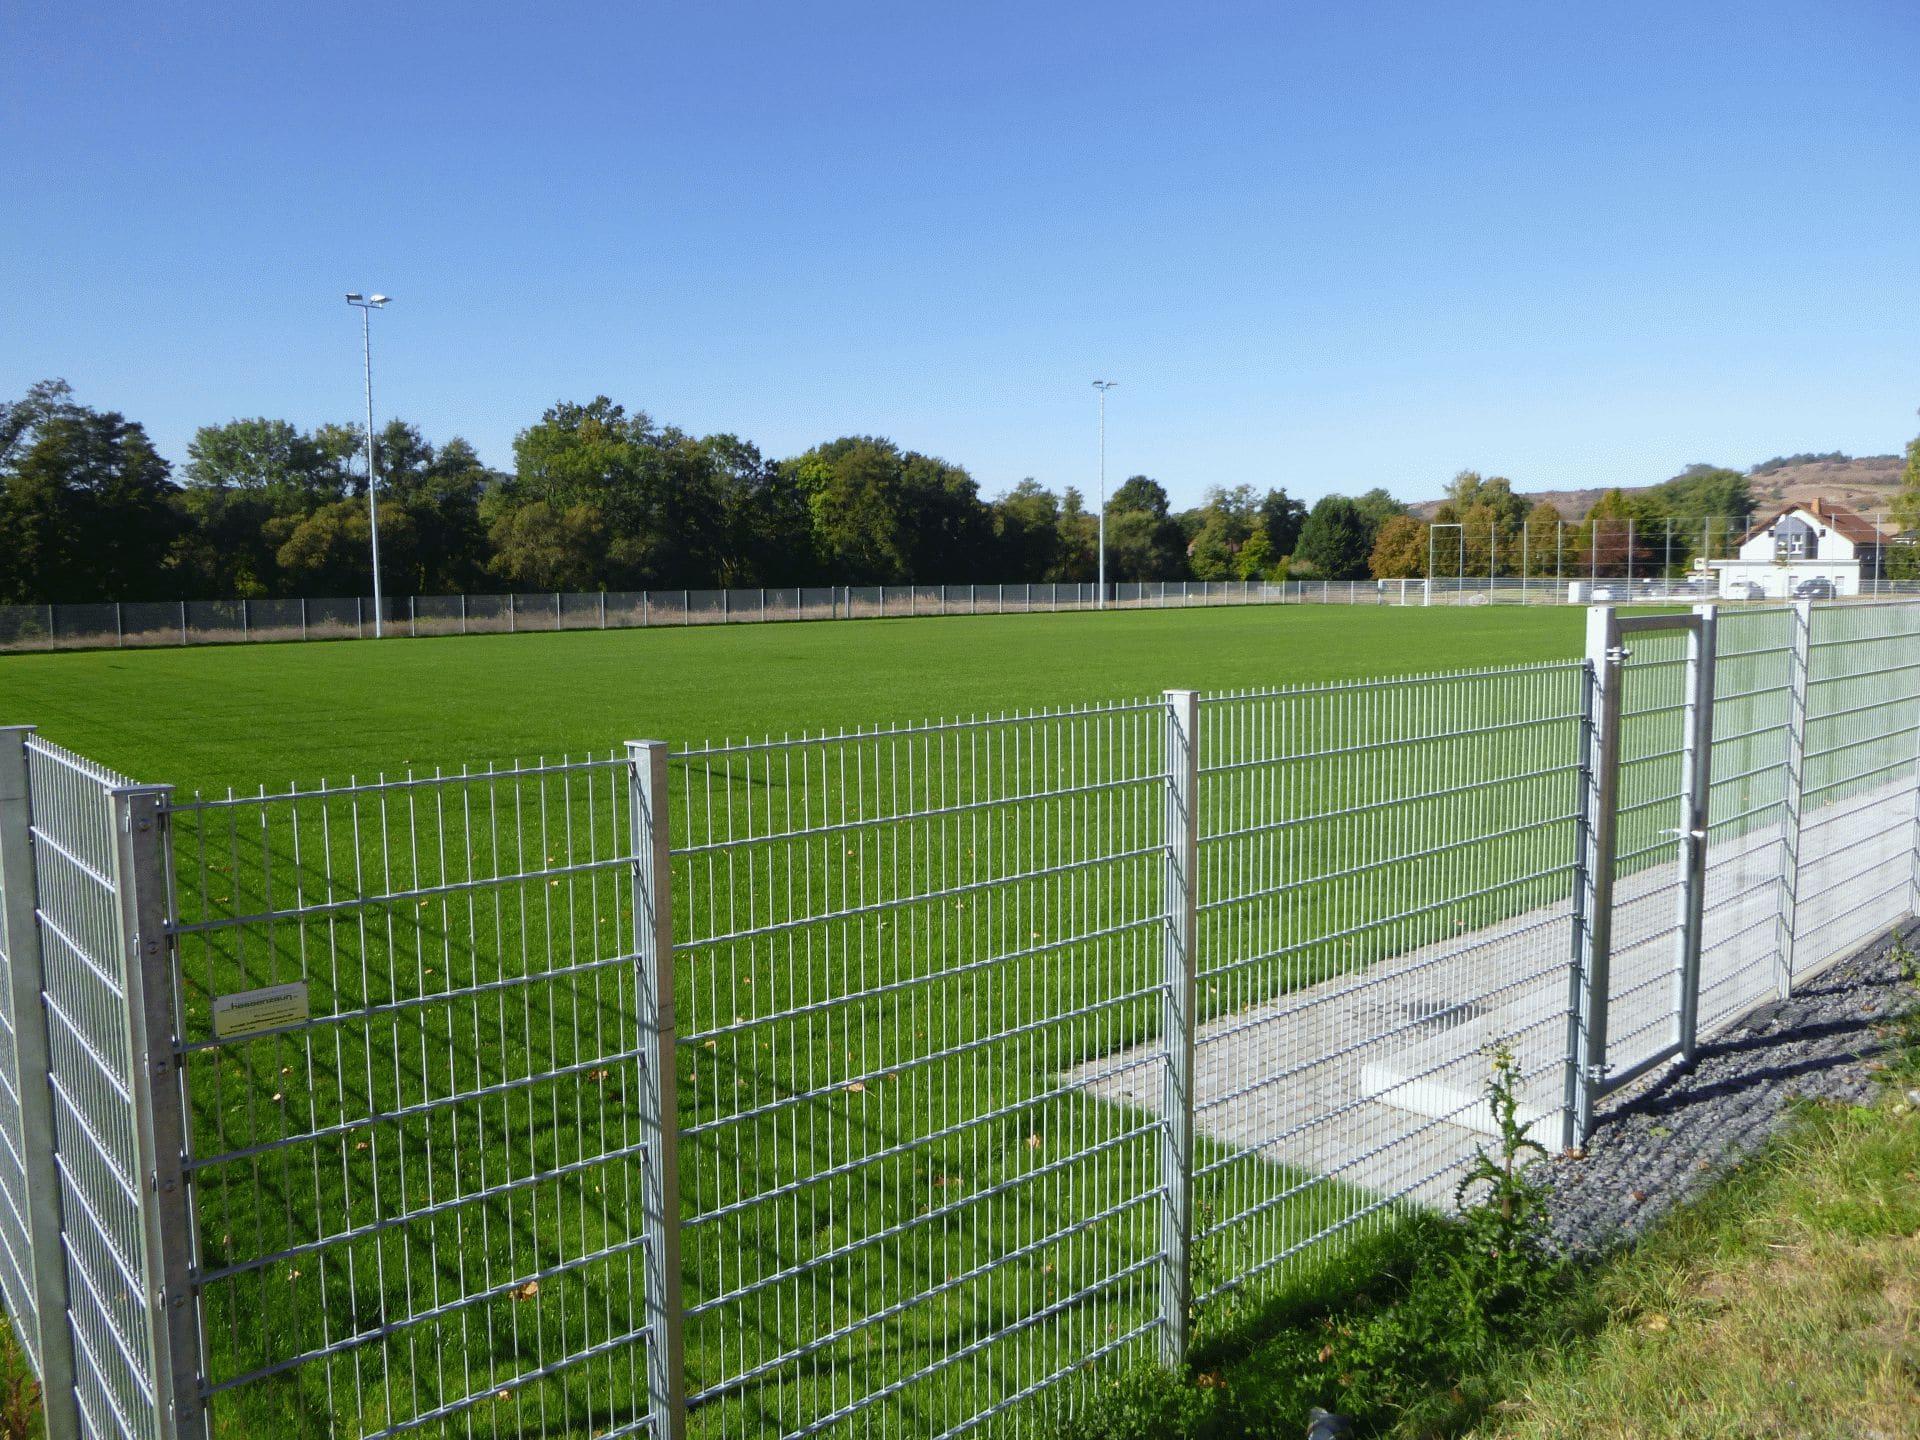 Sportplatzneubau September 2018 - Bild 2